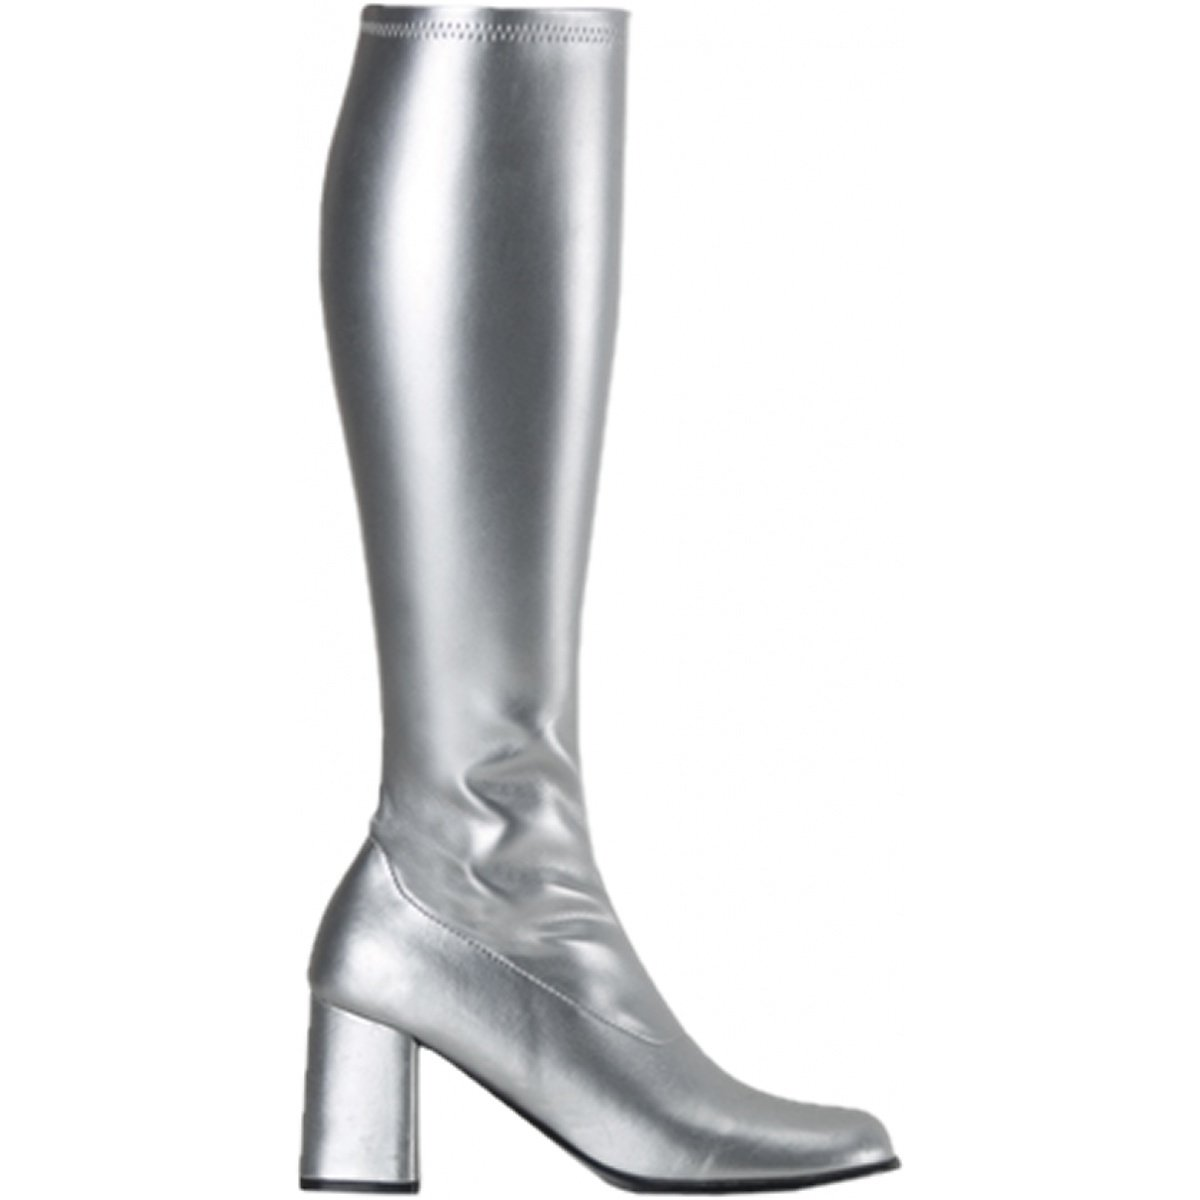 2e4b009c536 Funtasma by Pleaser Women's Gogo-300 Boot Purple Stretch Polyurethane Size  -9